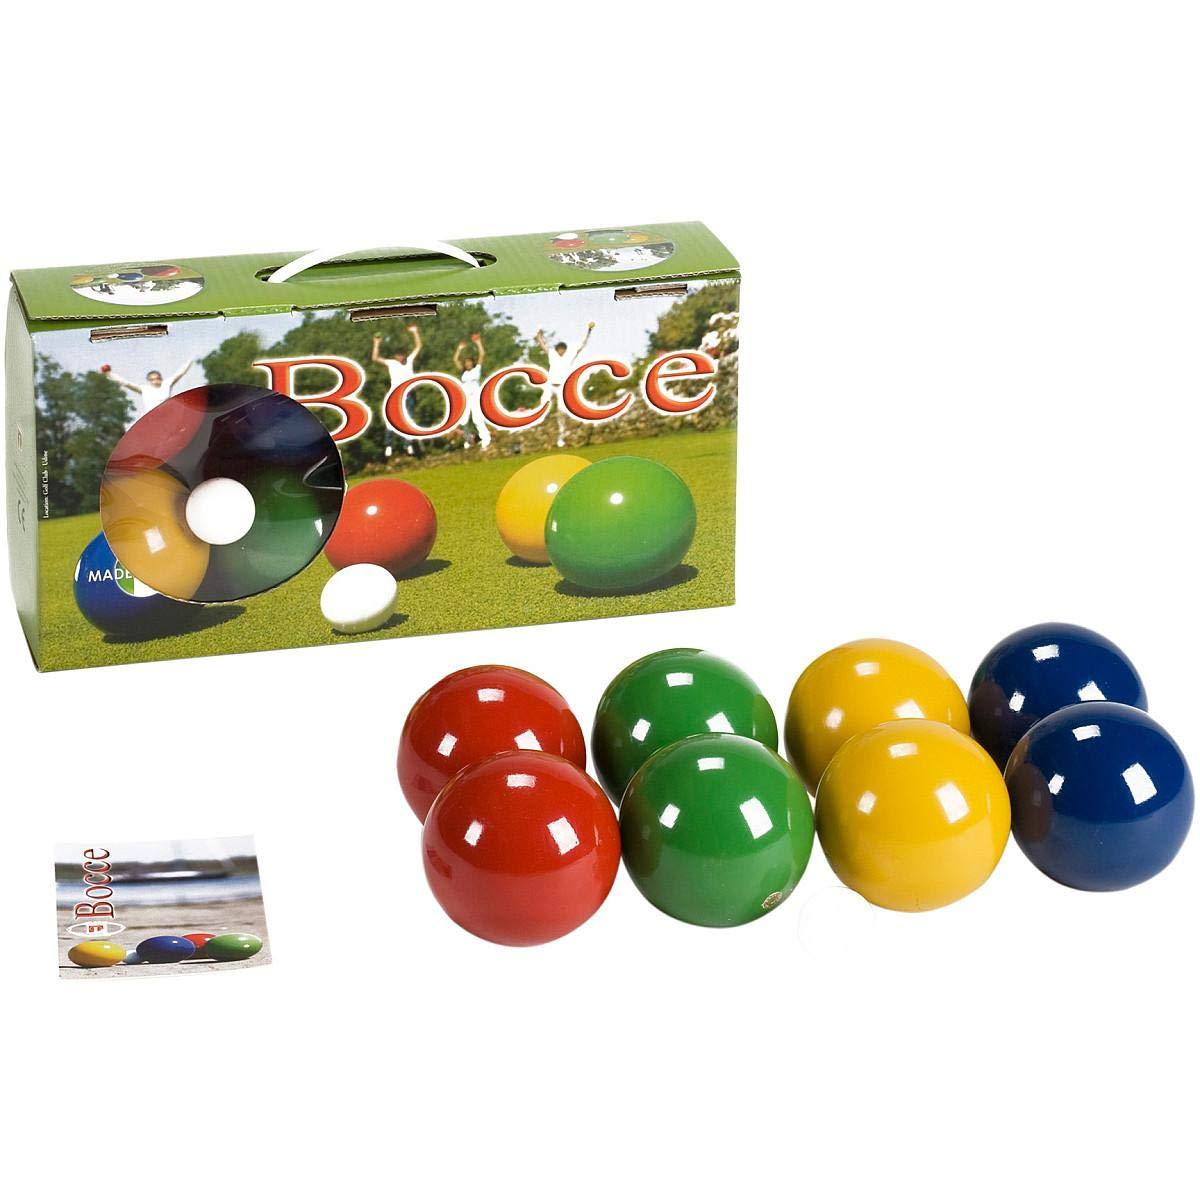 Toymarketing International Classic Bocce Set BAFDS 10-09004